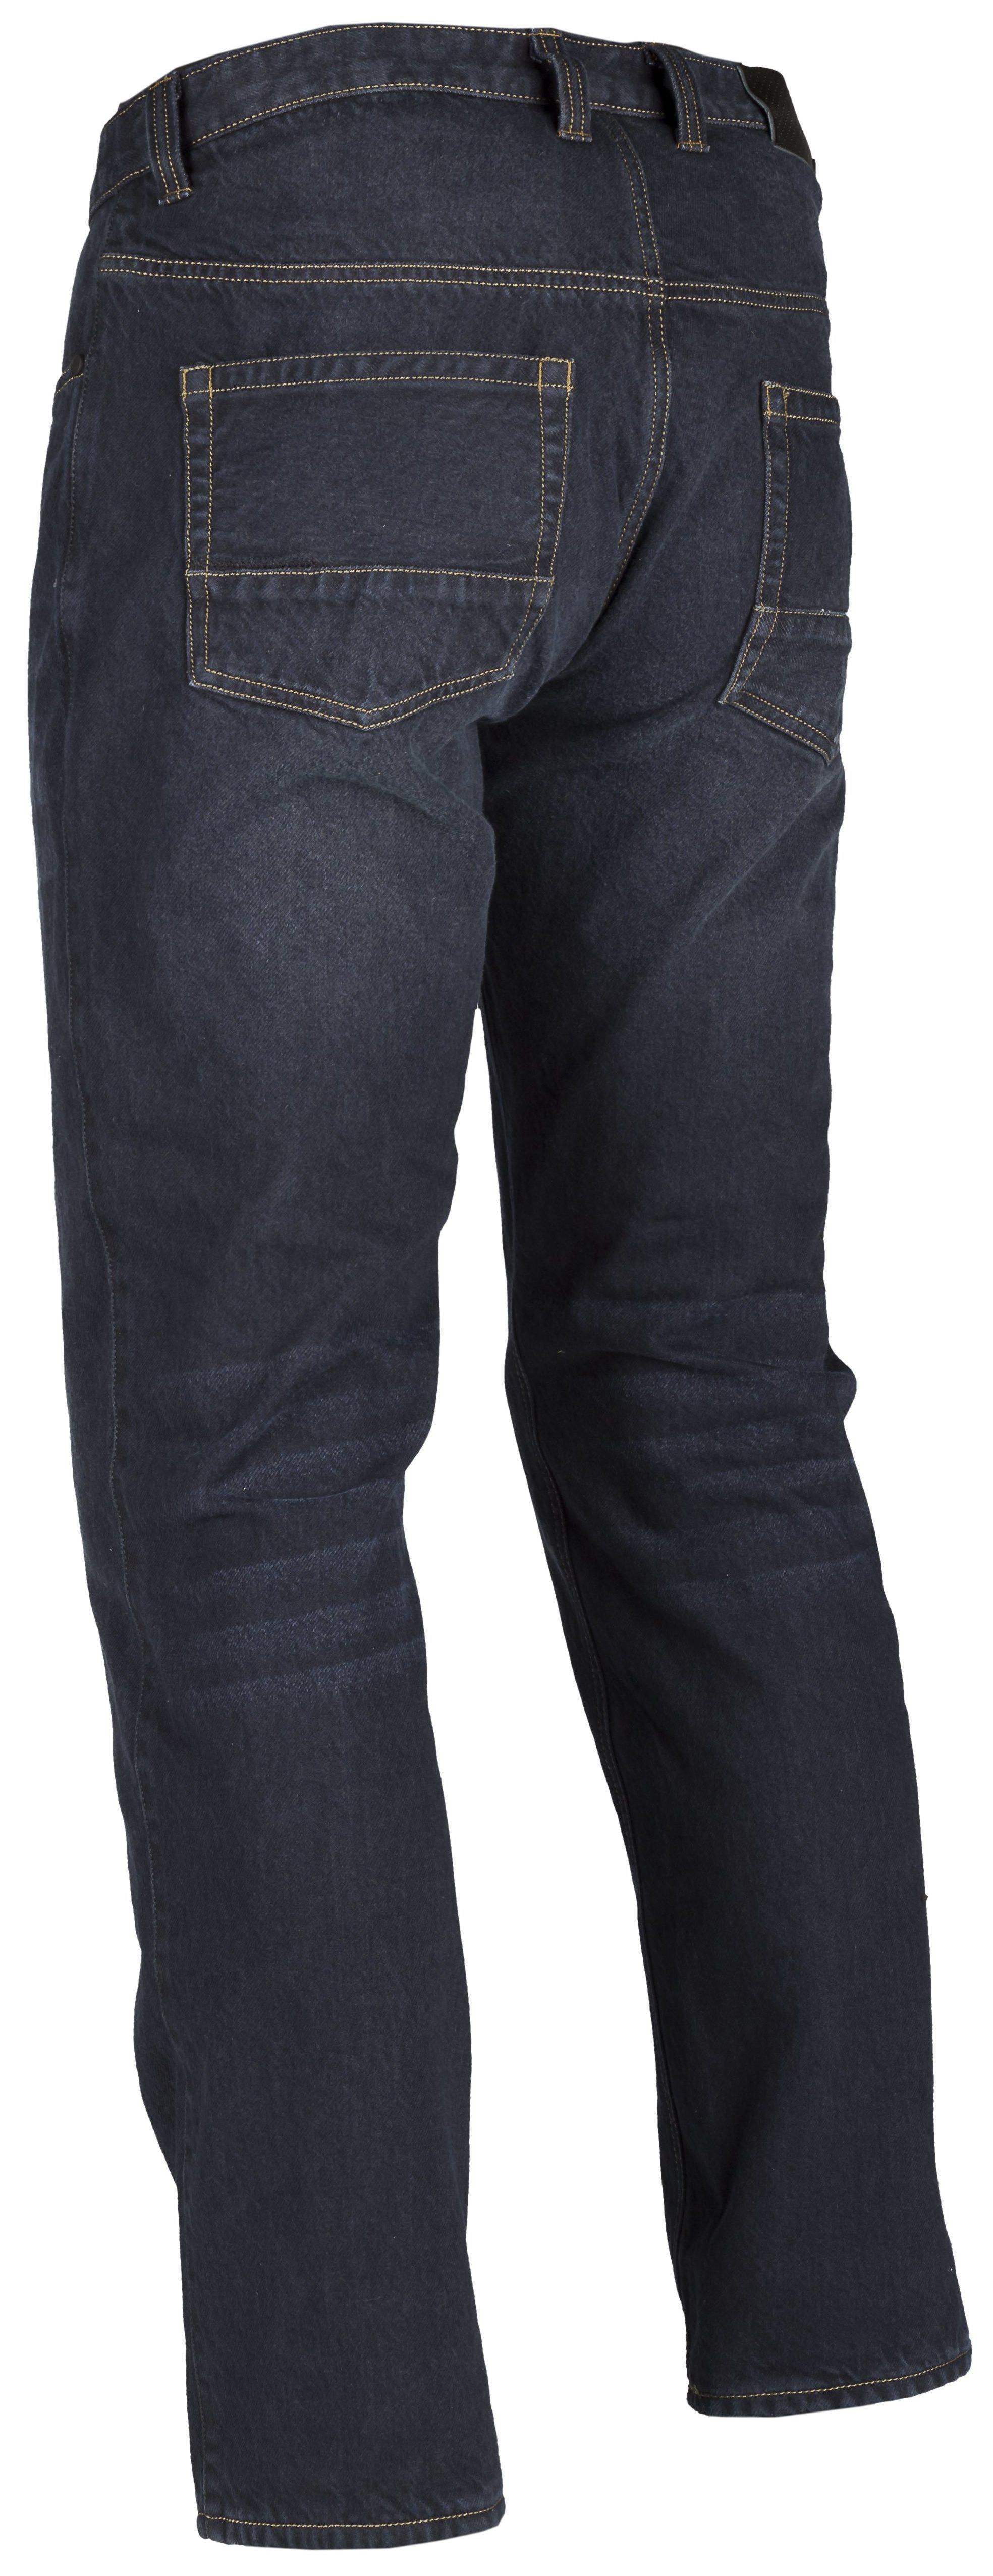 fb3b75d2e2 Klim K Fifty 2 Jeans - RevZilla